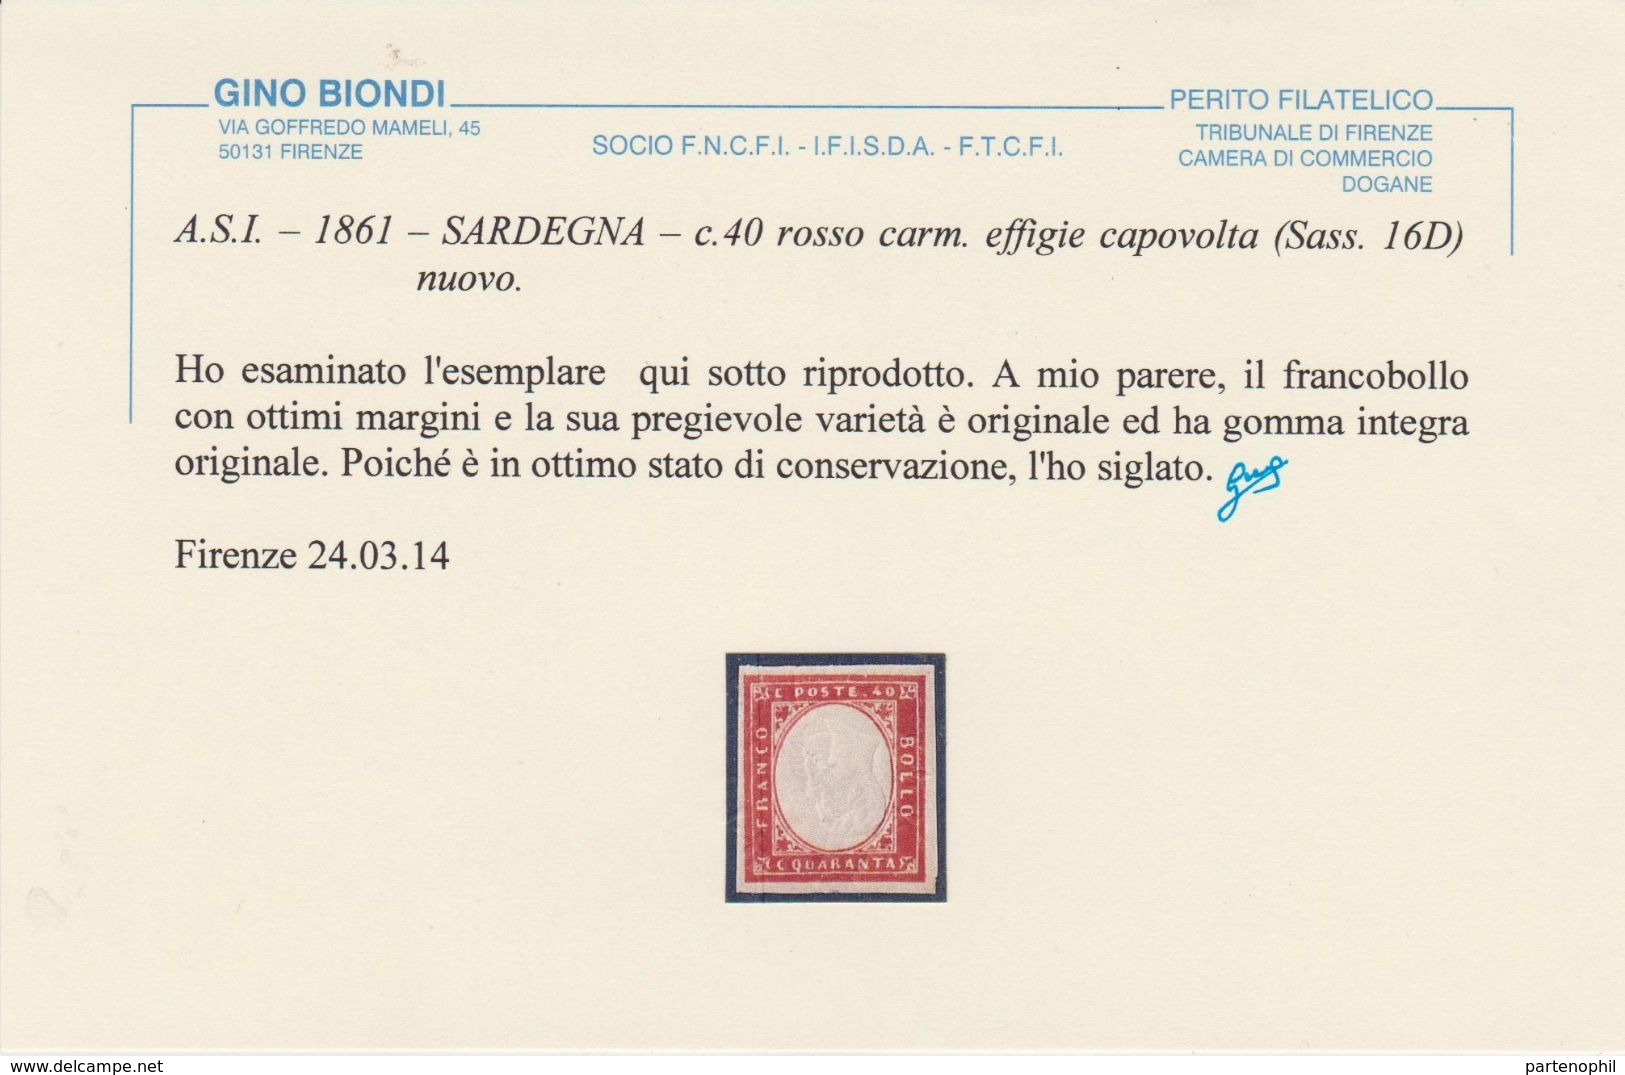 Sardegna 1861 40 C. Rosso Carm. Effige Capovolte ( Sass. 16D ) Con Gomma Integra. MNH Cert. Biondi. - Sardegna